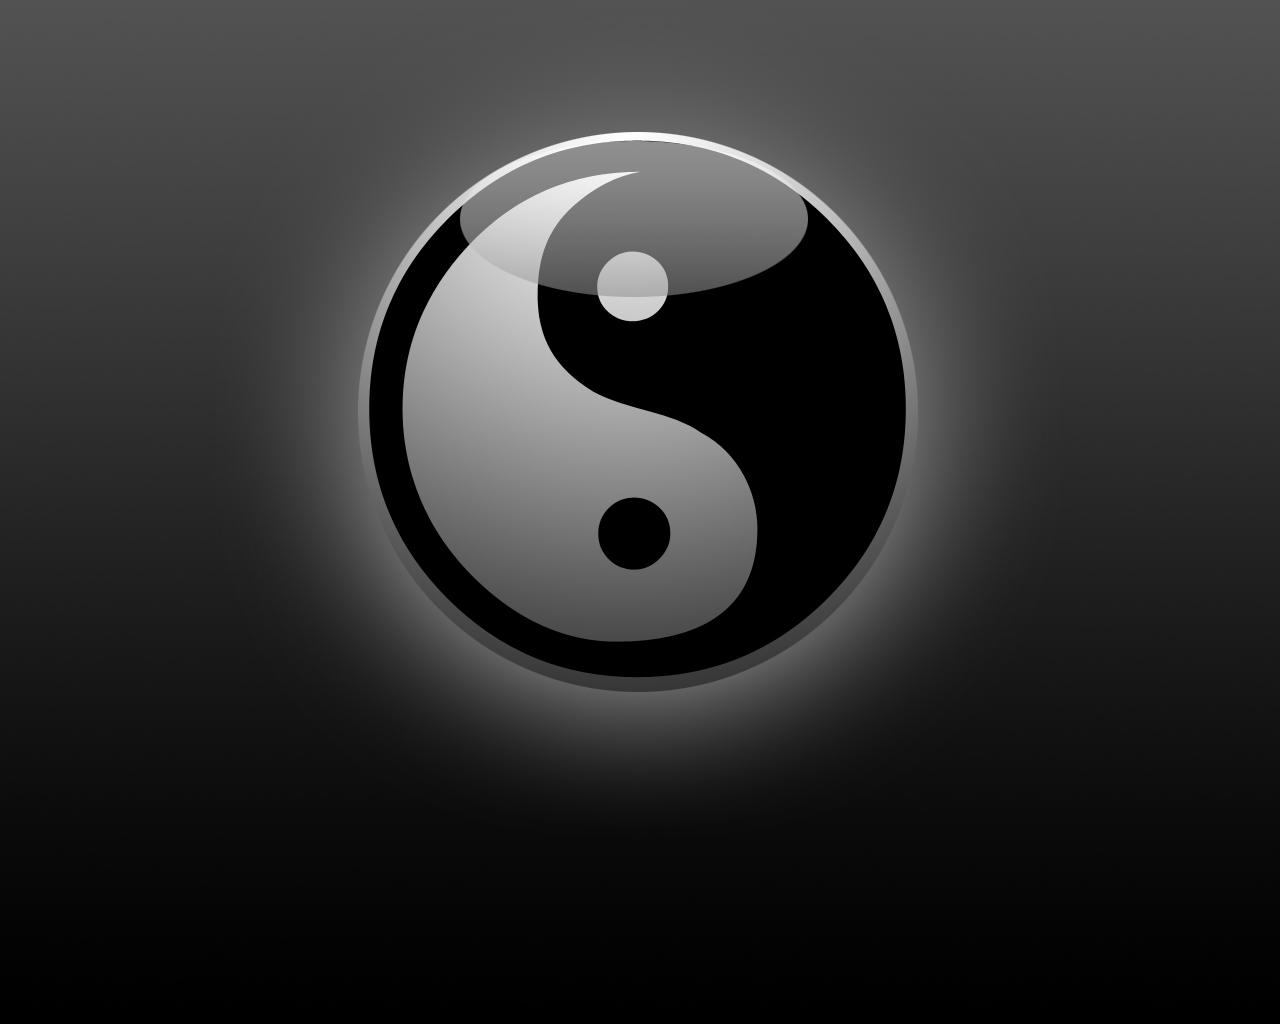 Download Yin Yang Wallpaper 1280x1024 | Wallpoper #375896